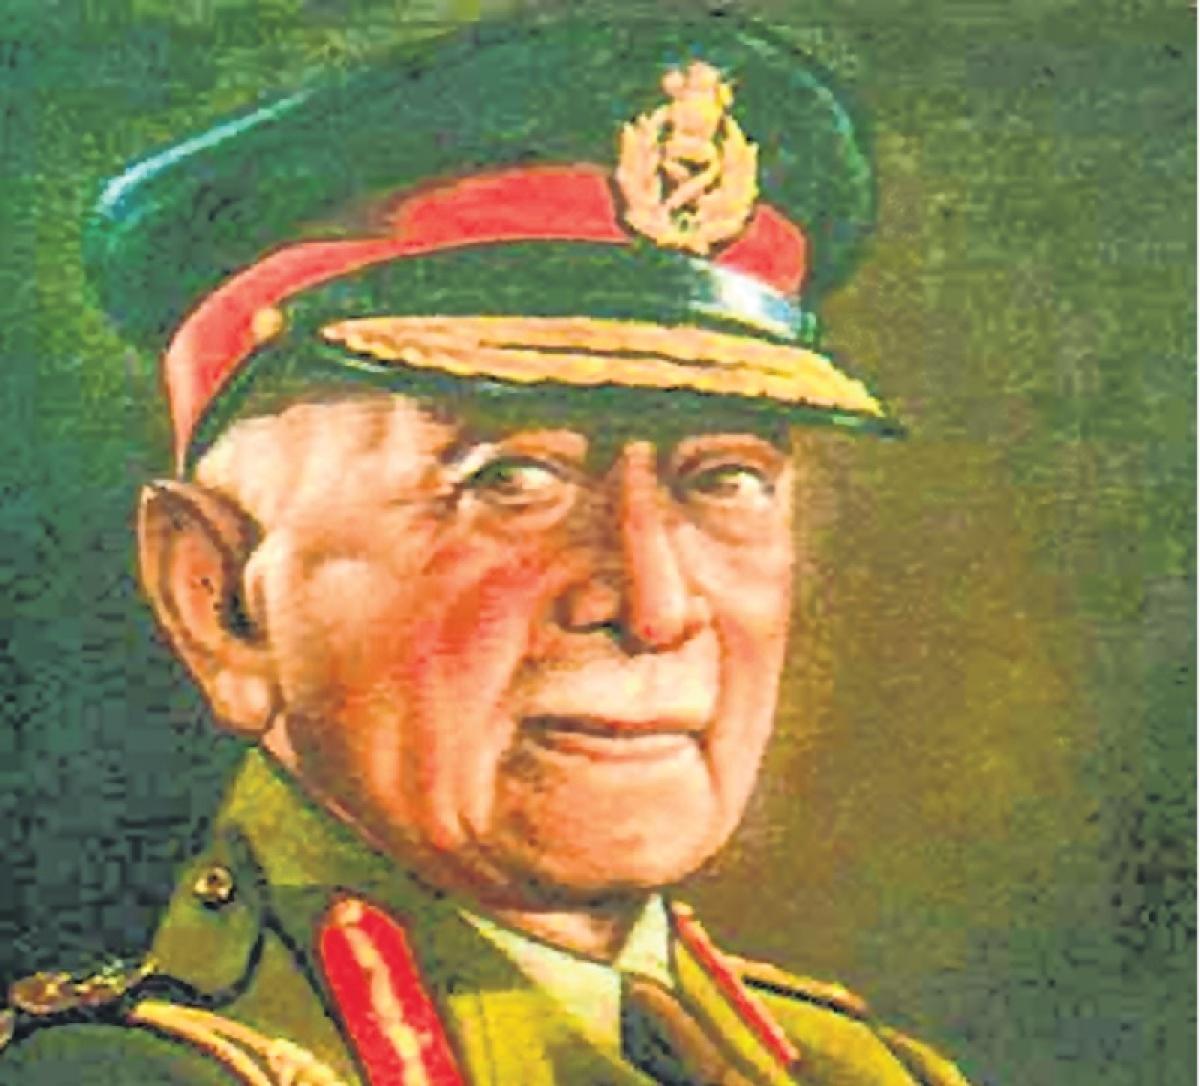 Don't release my son, Nanda Cariappa told Pakistan in 1965